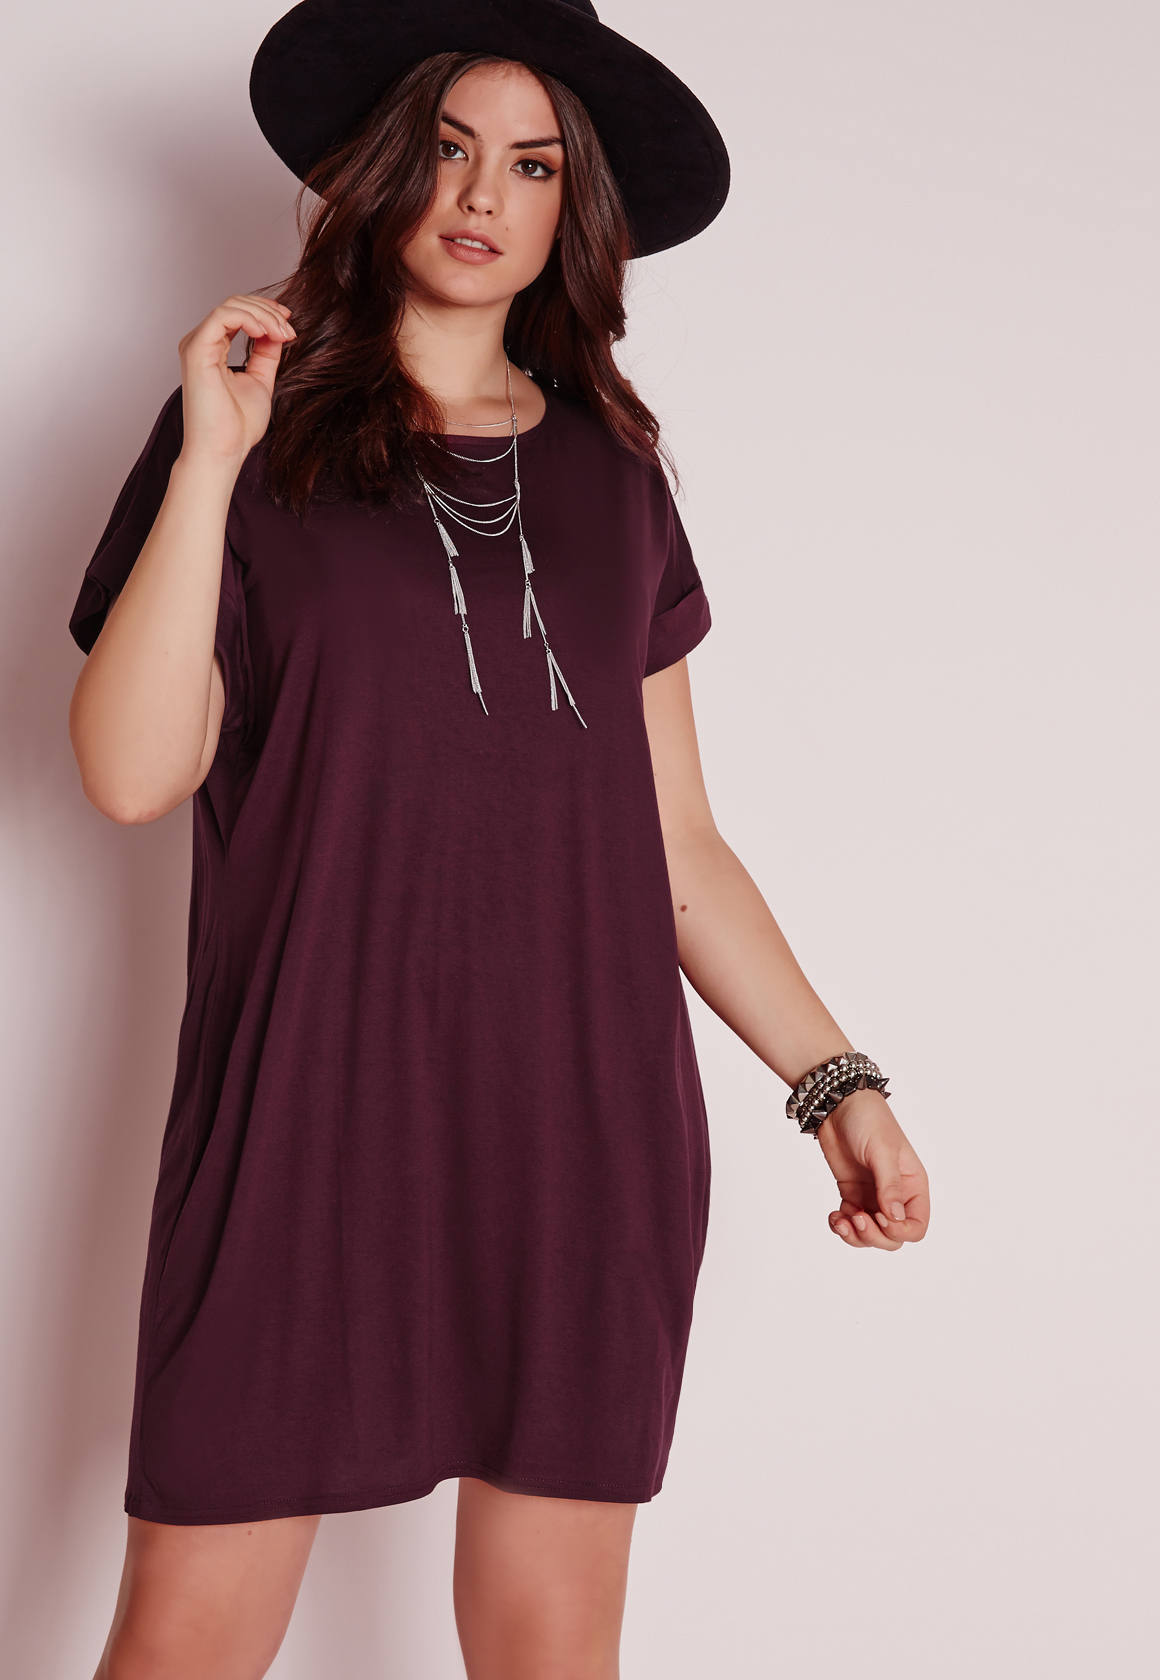 Lyst - Missguided Plus Size T-shirt Dress Purple in Purple